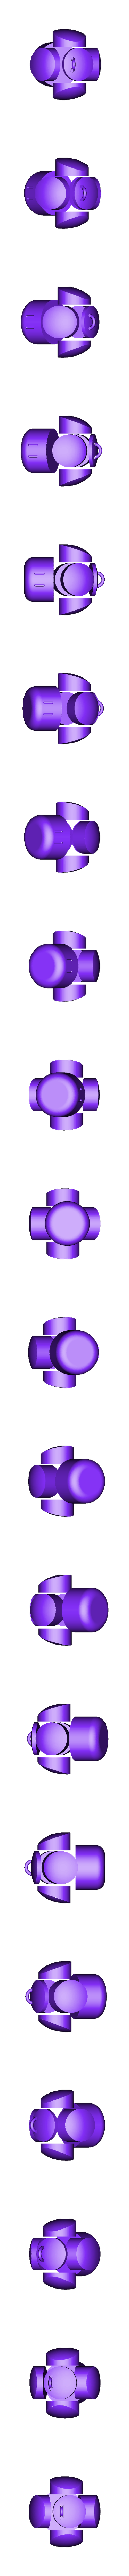 mushroom_dual_a.stl Download free STL file Super Mario Mushroom 1UP Hanger (Dual & Modular Single Extrusion) • 3D printable design, Runstone